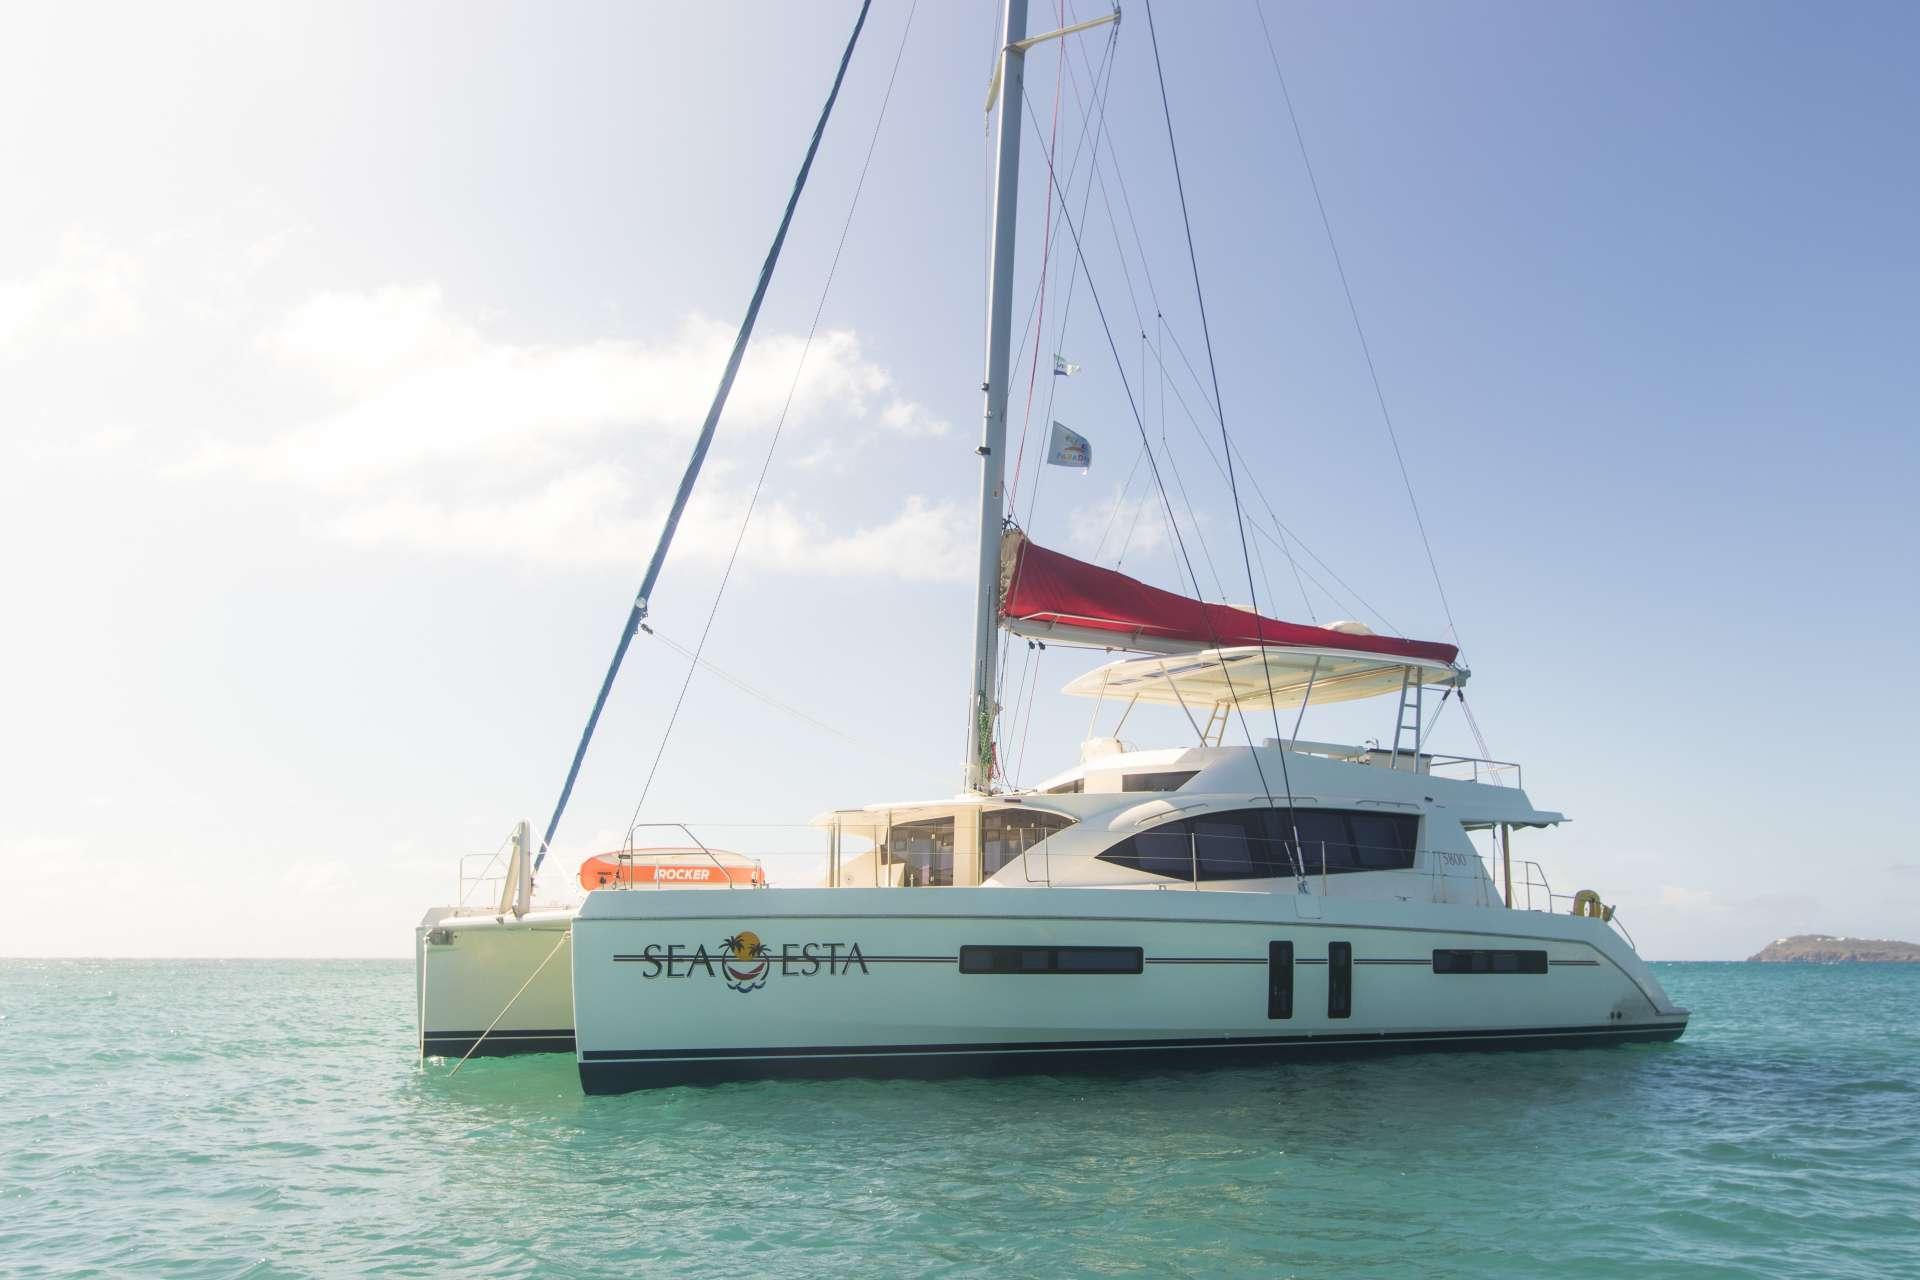 Main image of SEA ESTA yacht